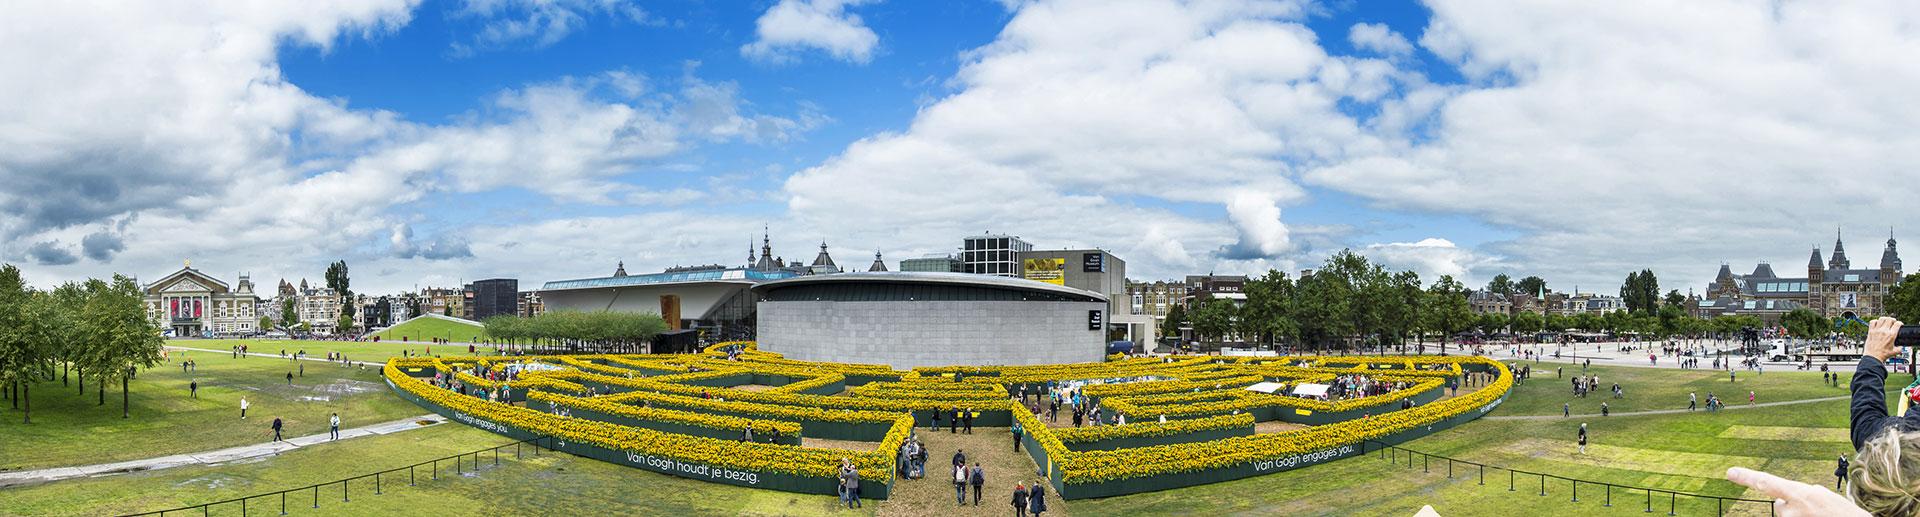 Labyrint van Gogh Museum